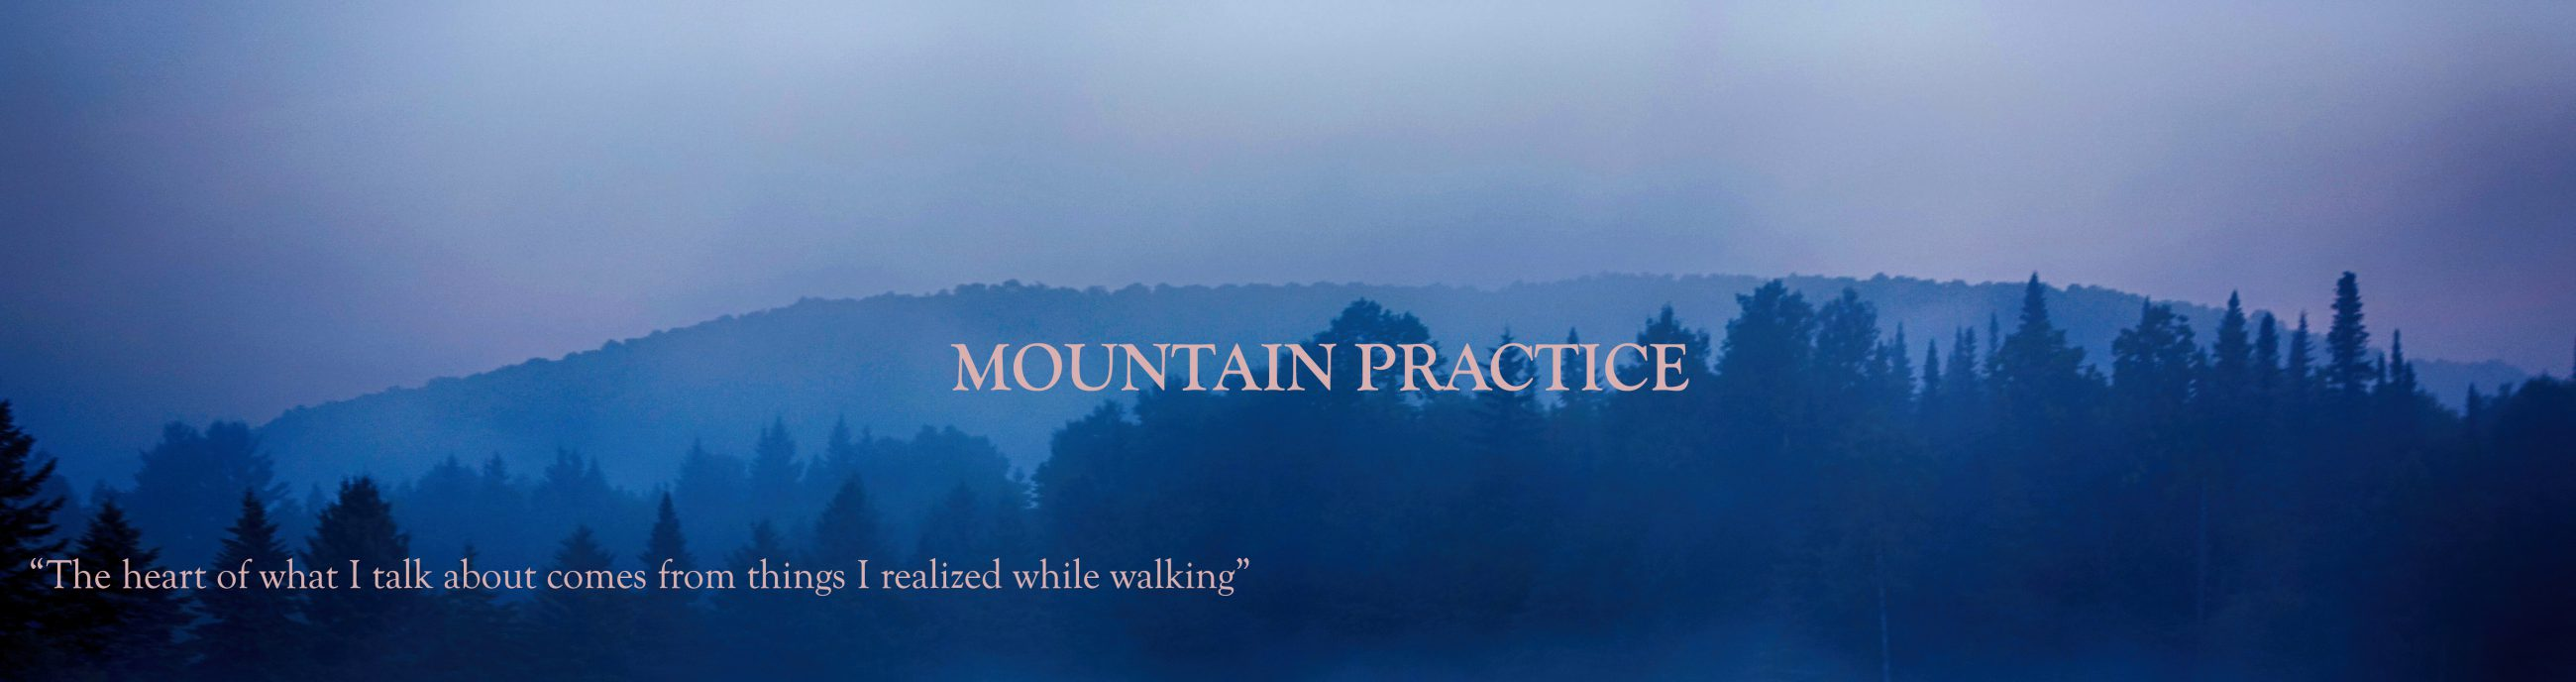 Mountain Practice